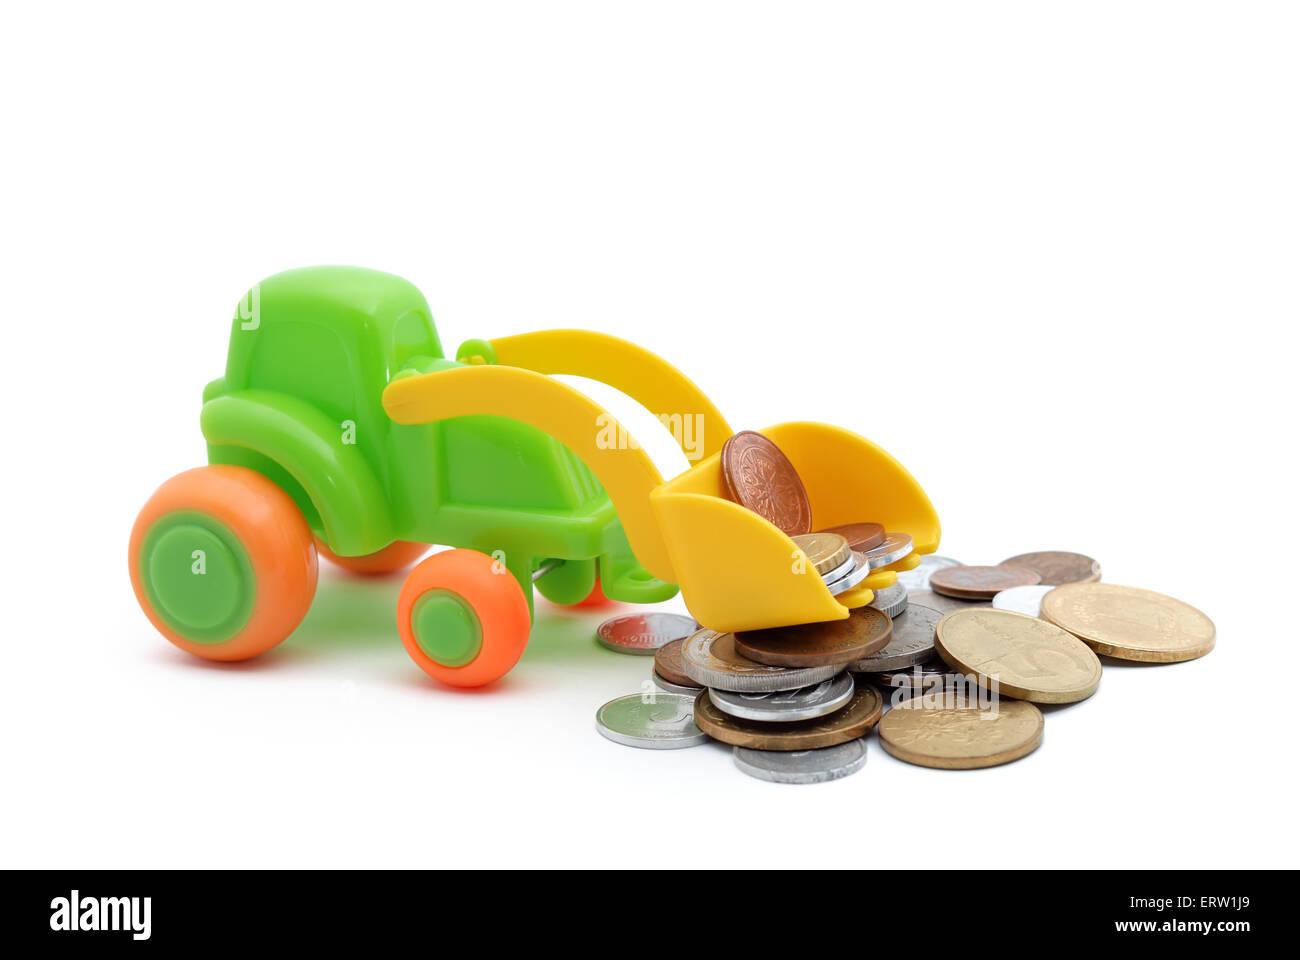 The toy excavator loads money on white background Stock Photo